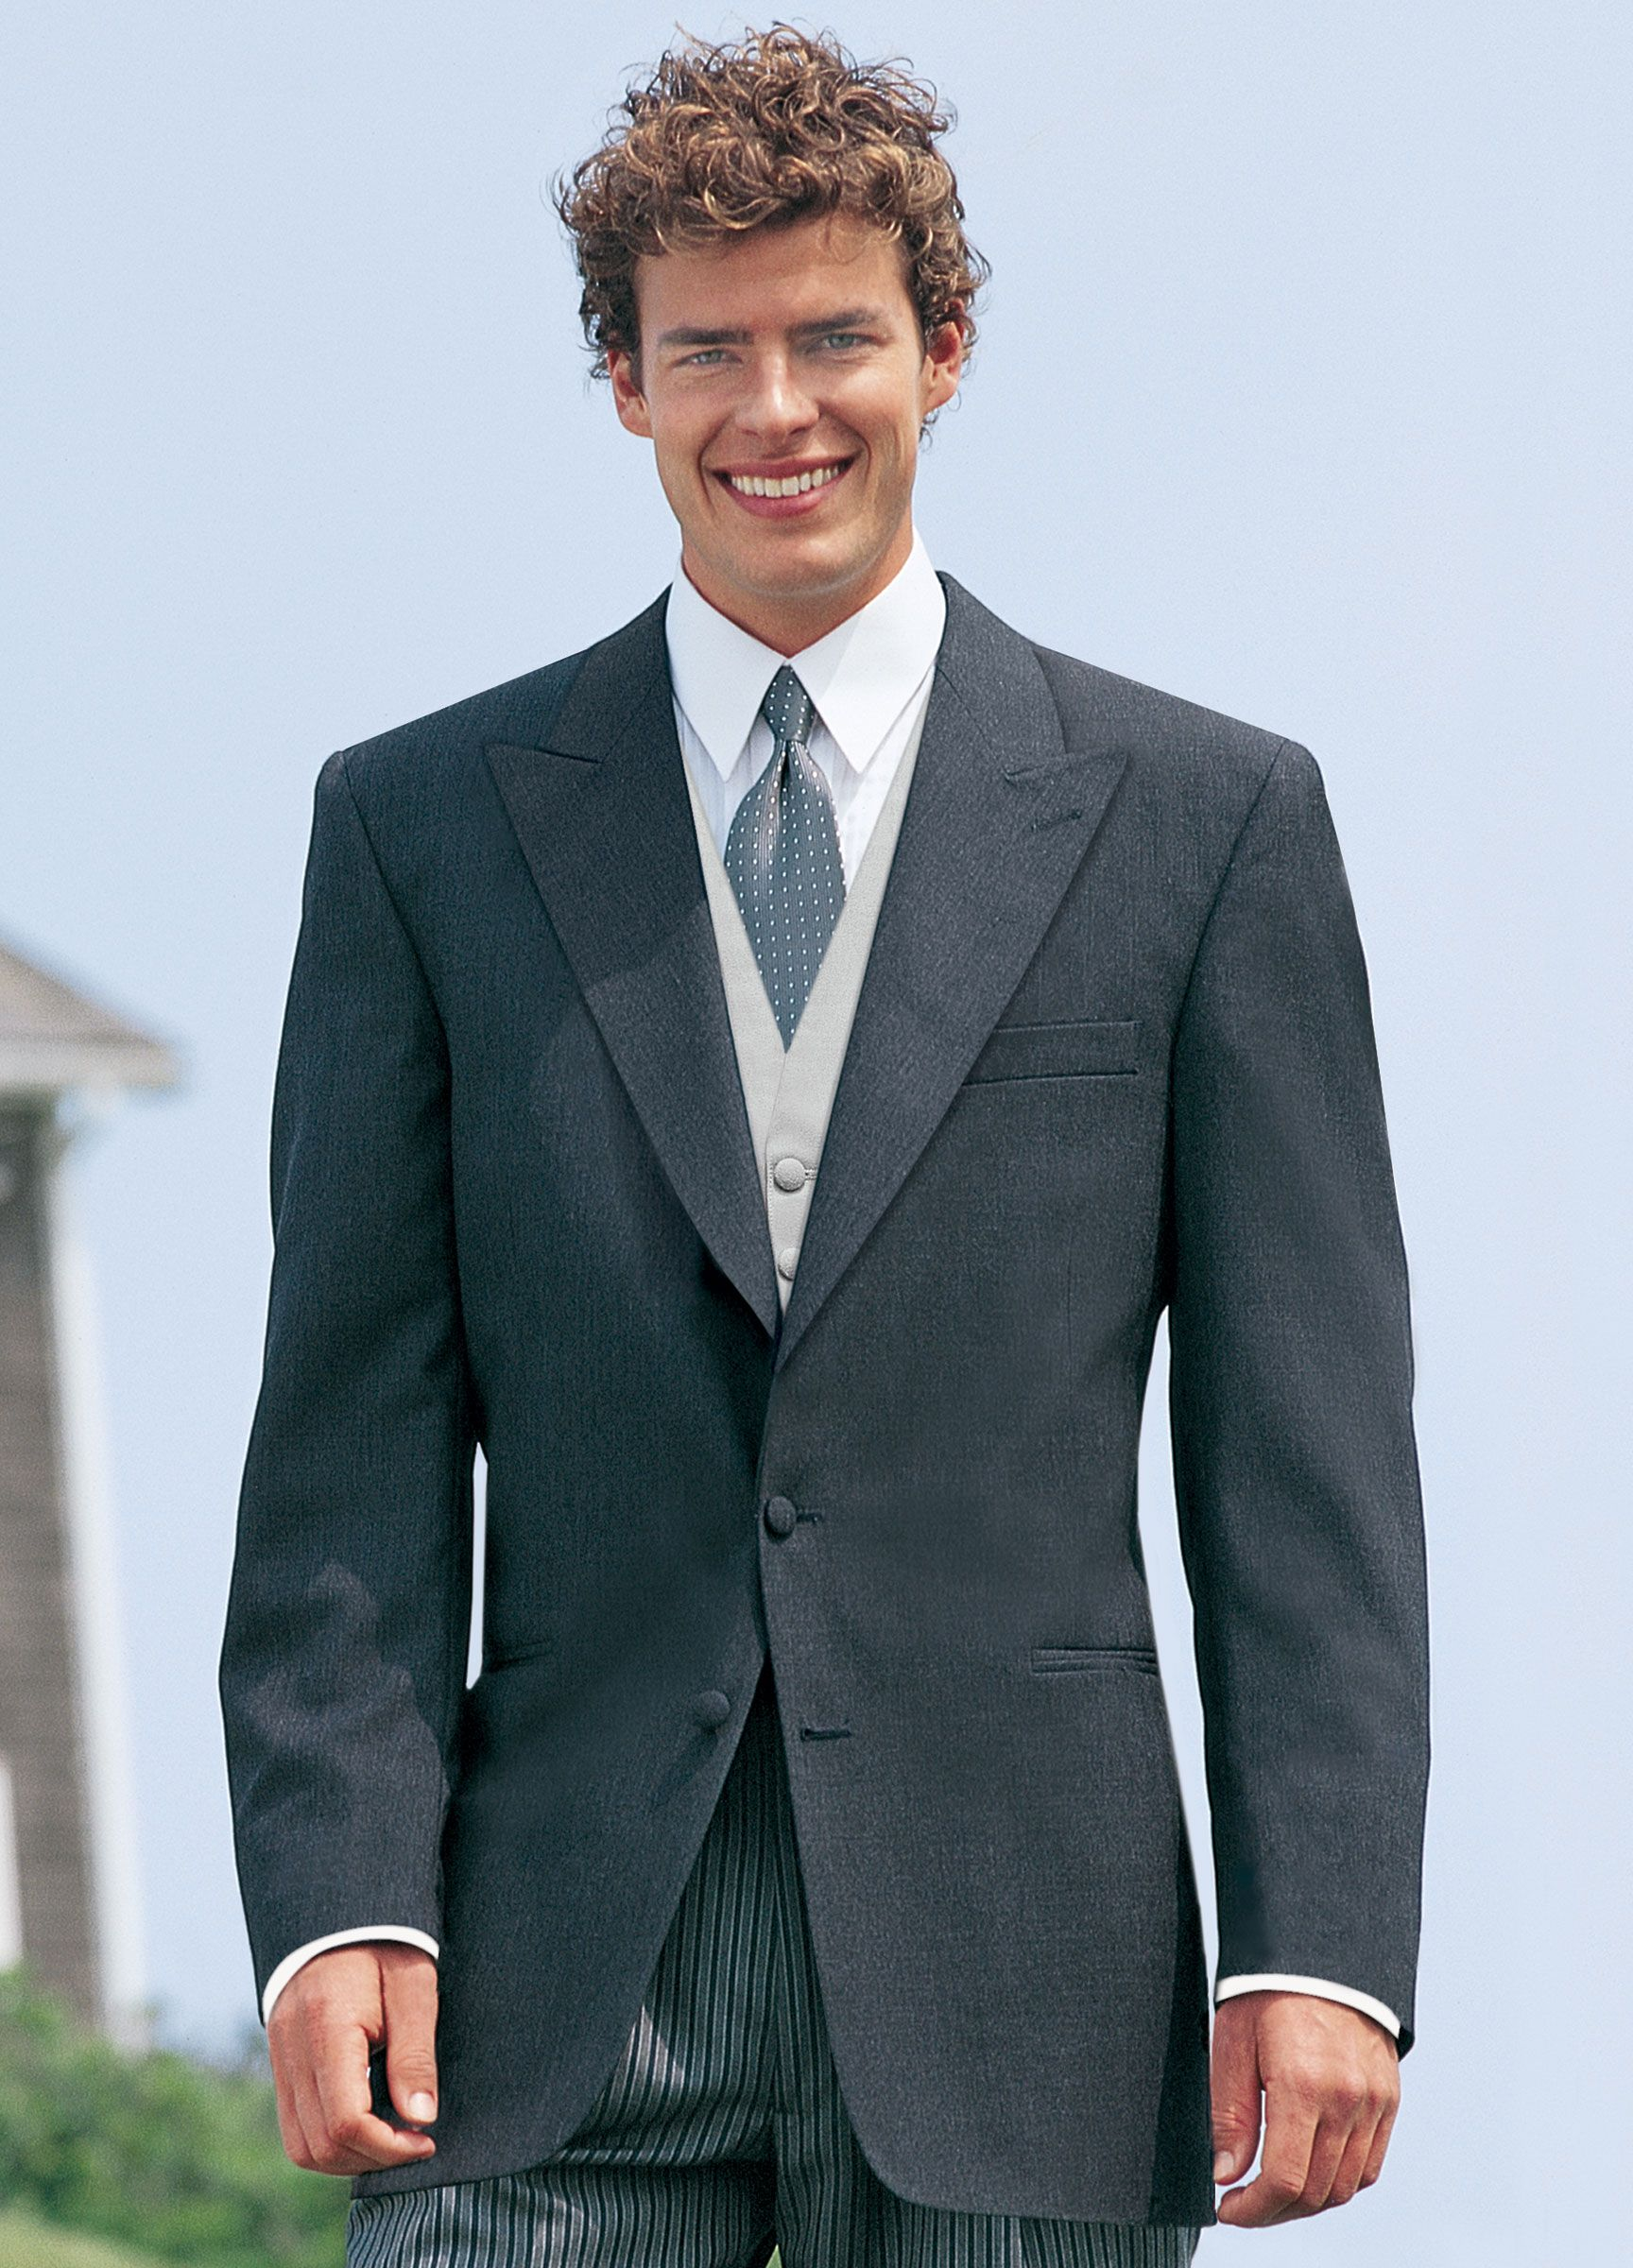 Wedding Tuxedo Rental Tuxedo suit, Tuxedo wedding